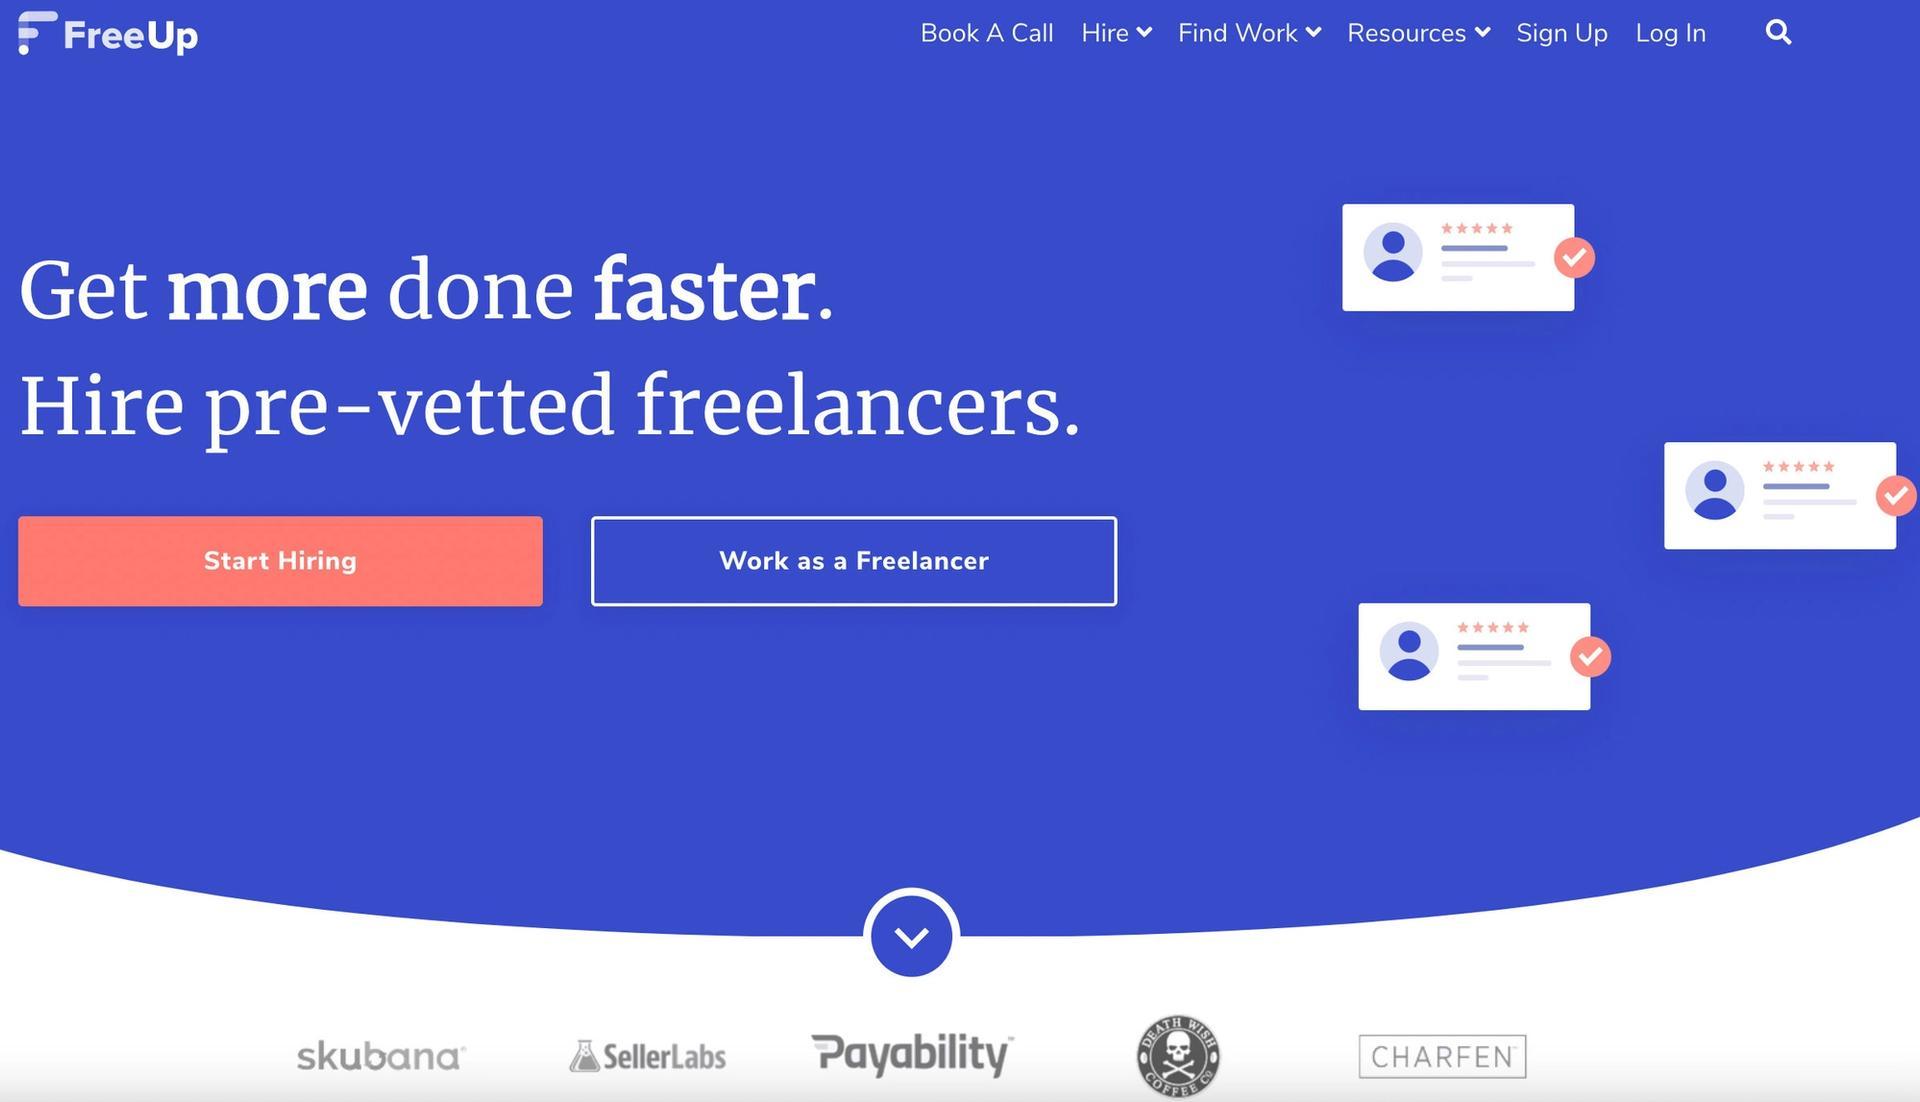 FreeUp homepage screenshot